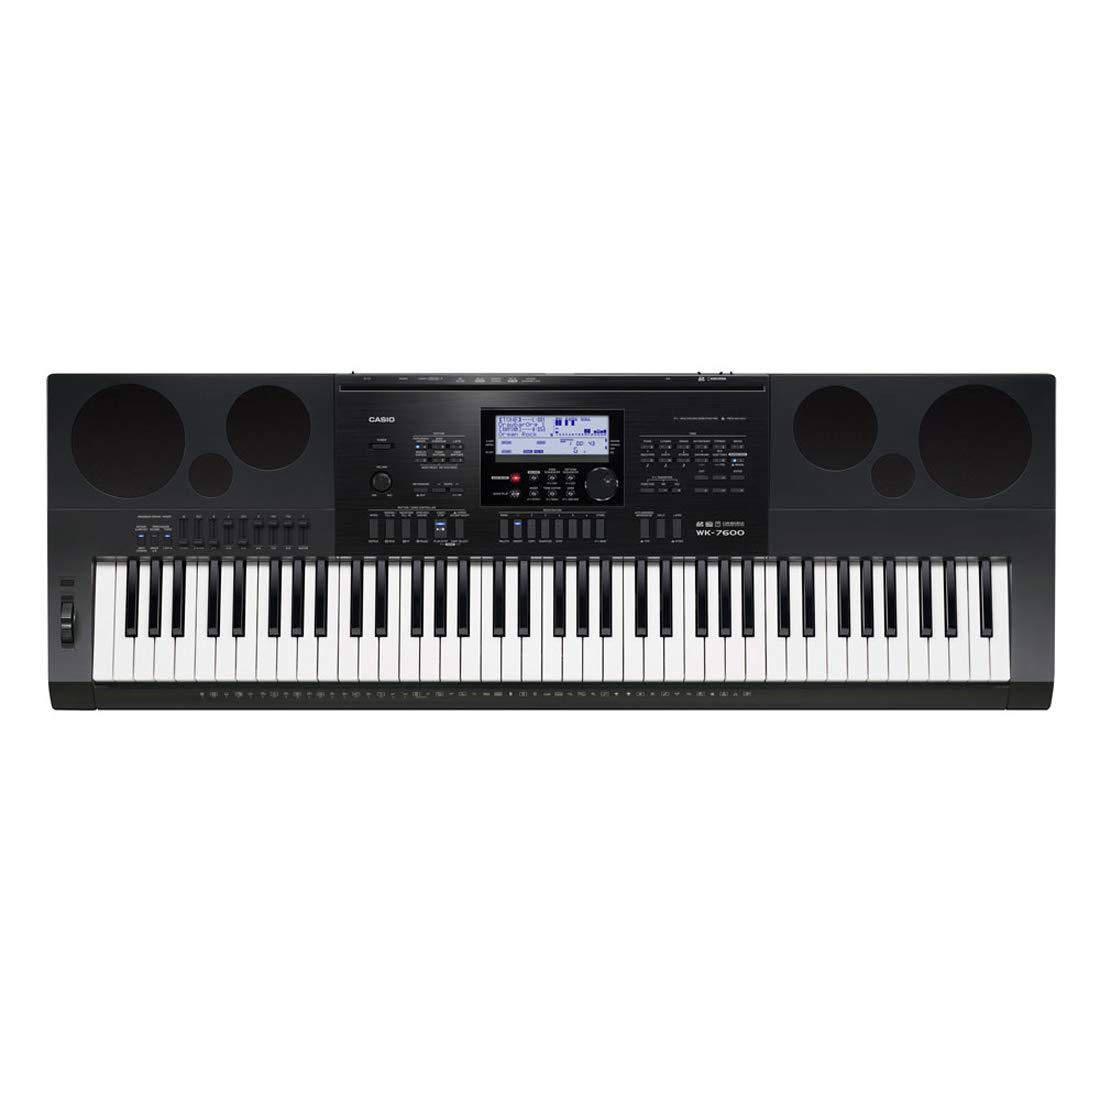 Keys Of Casio WK 7600